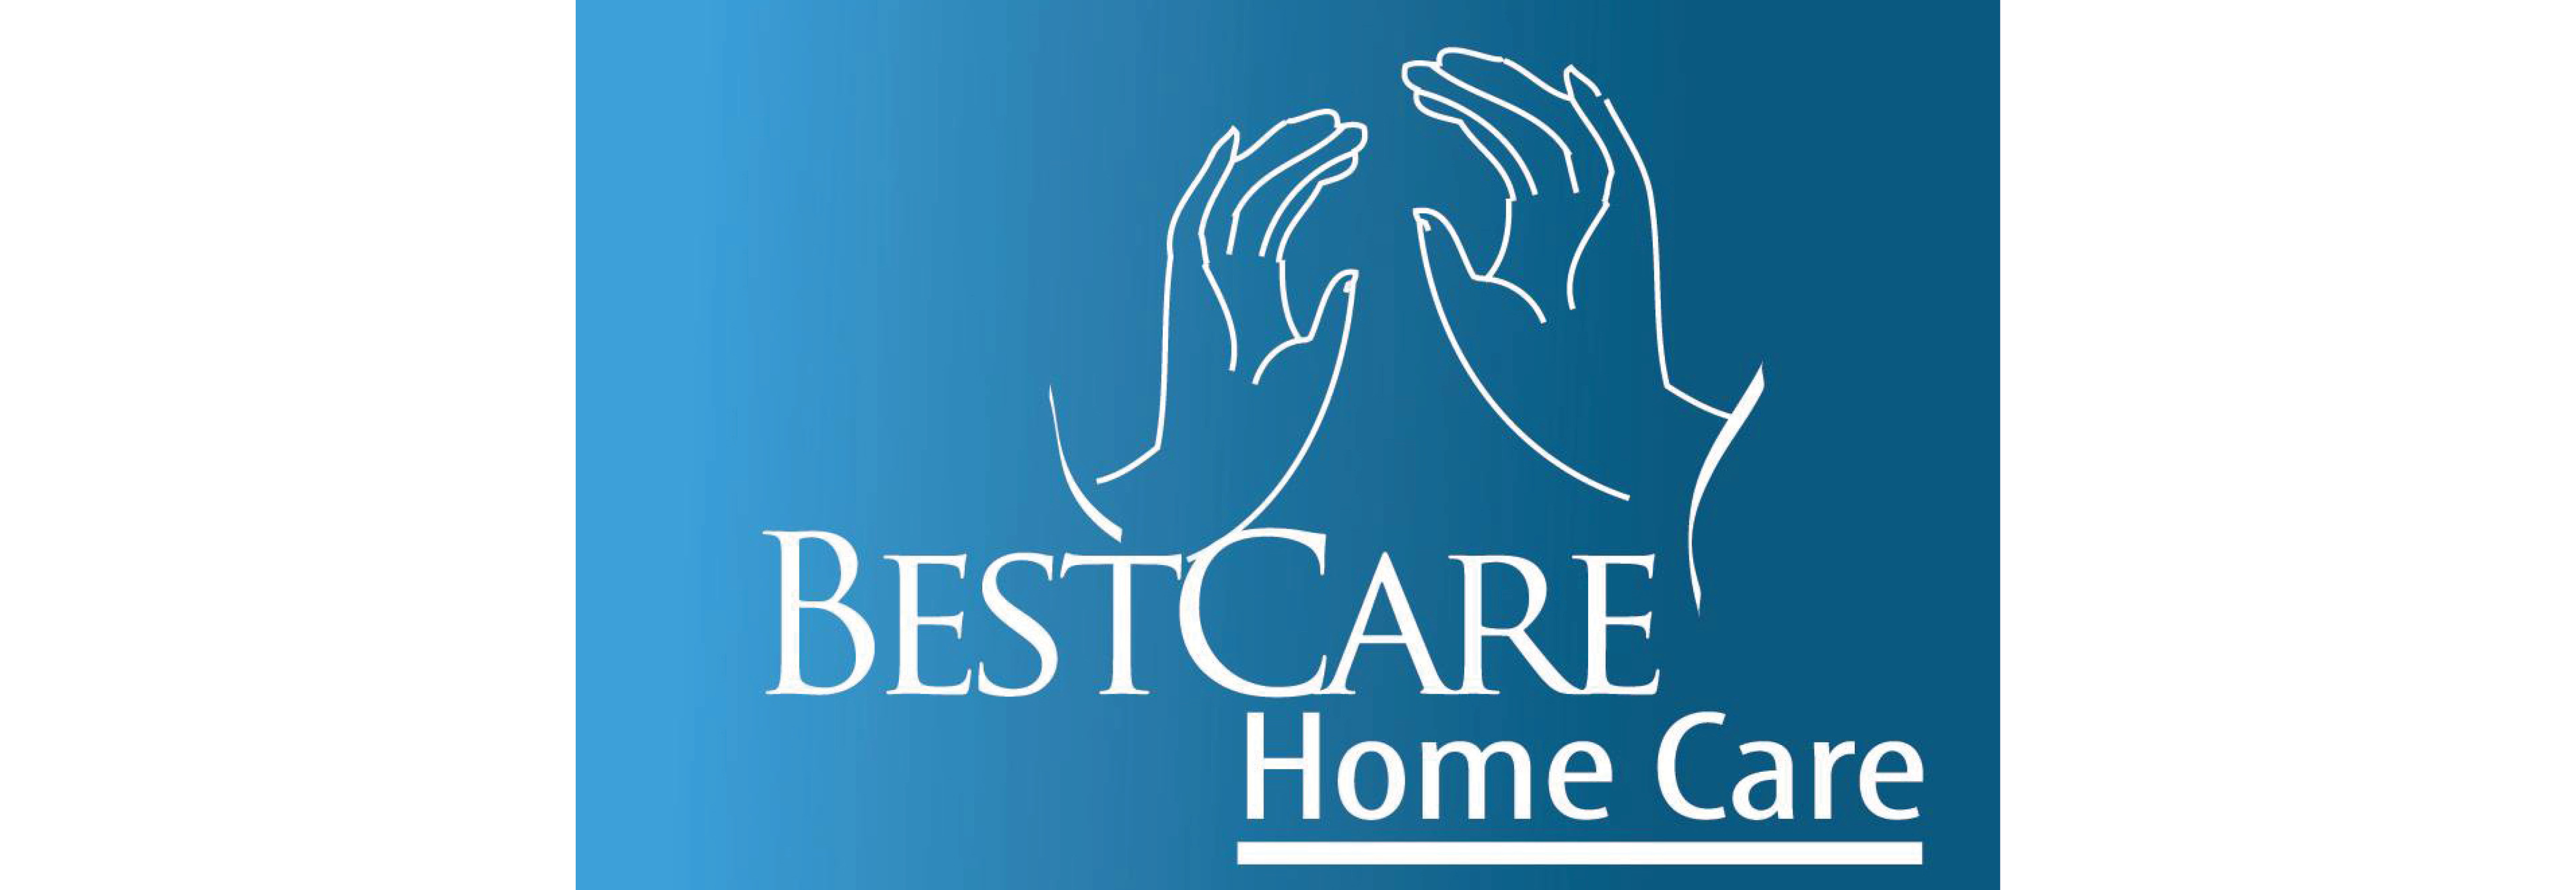 Bestcare Home Care